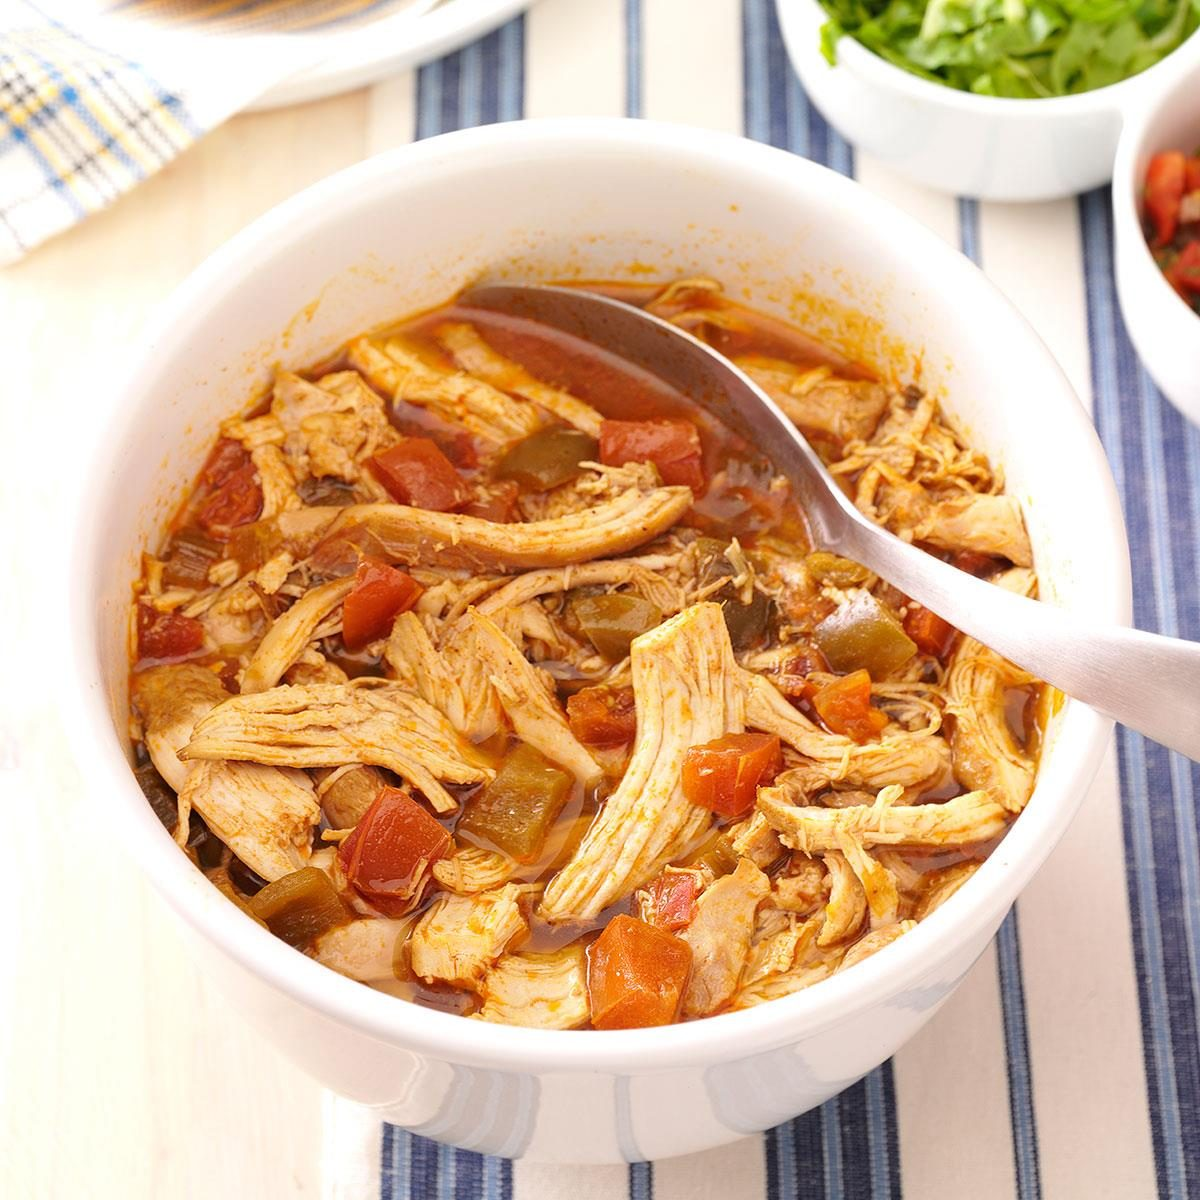 Spicy Shredded Chicken Recipe